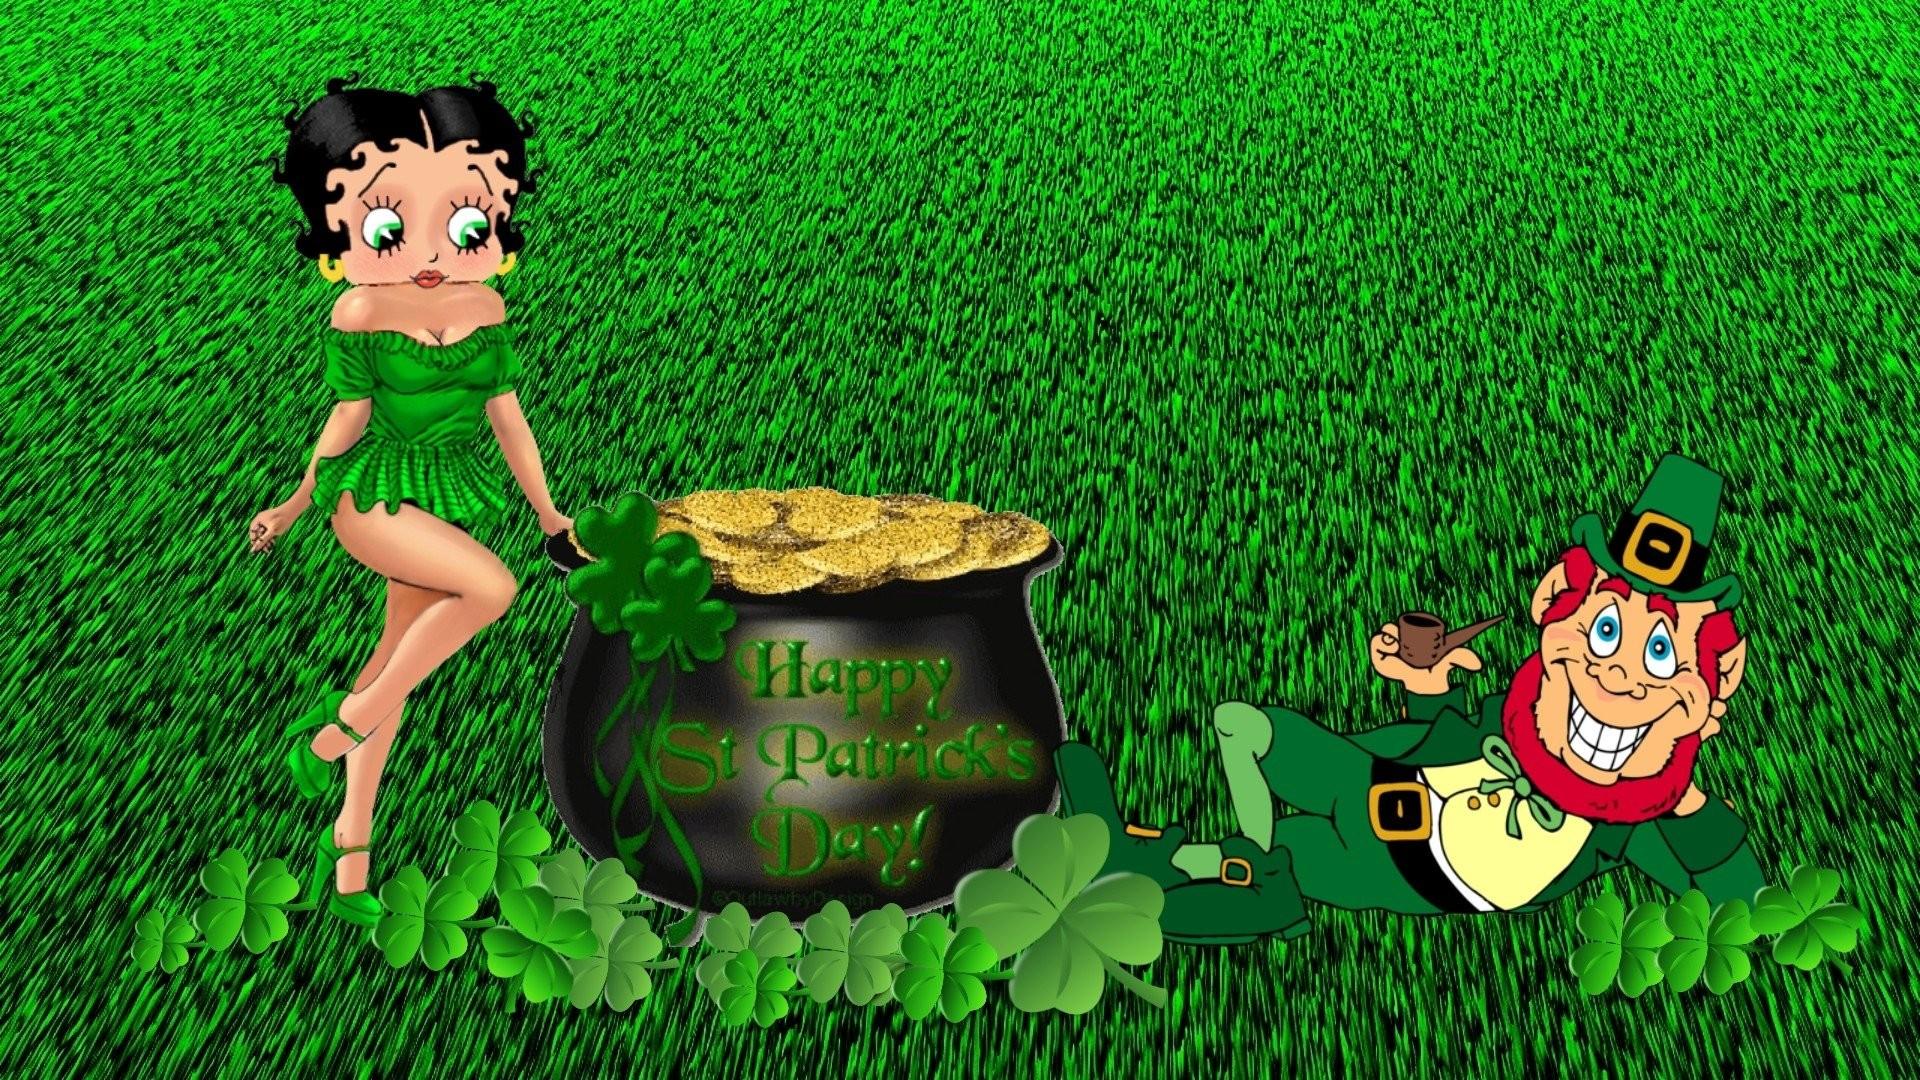 St Patricks Day Wallpaper Download Free Amazing Hd